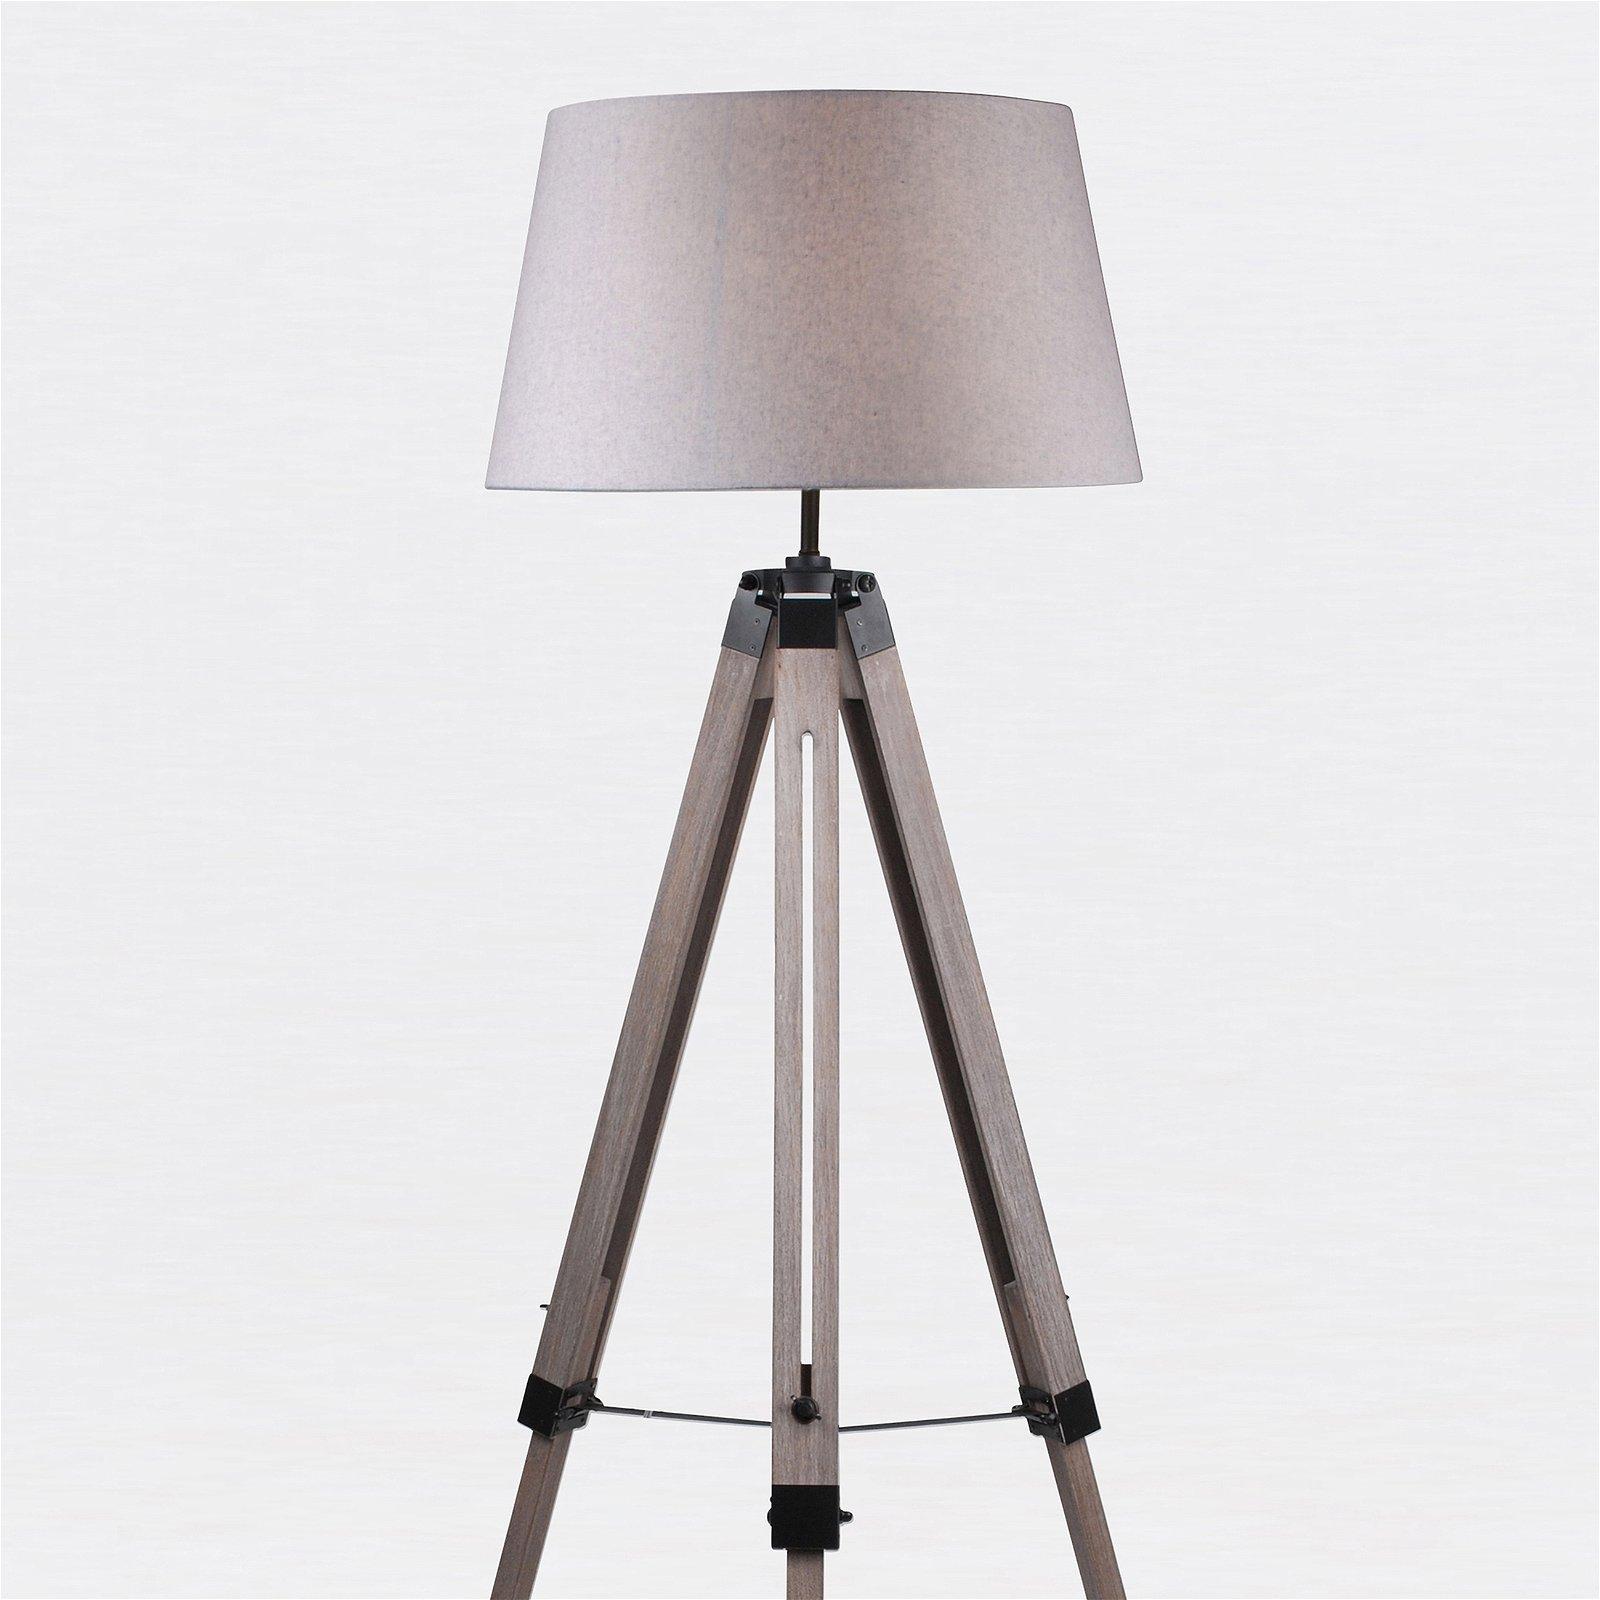 thumbnail 12 - Grey Wash Tripod Wood Table or Floor Lamp Black Painted Metal and Grey Shade